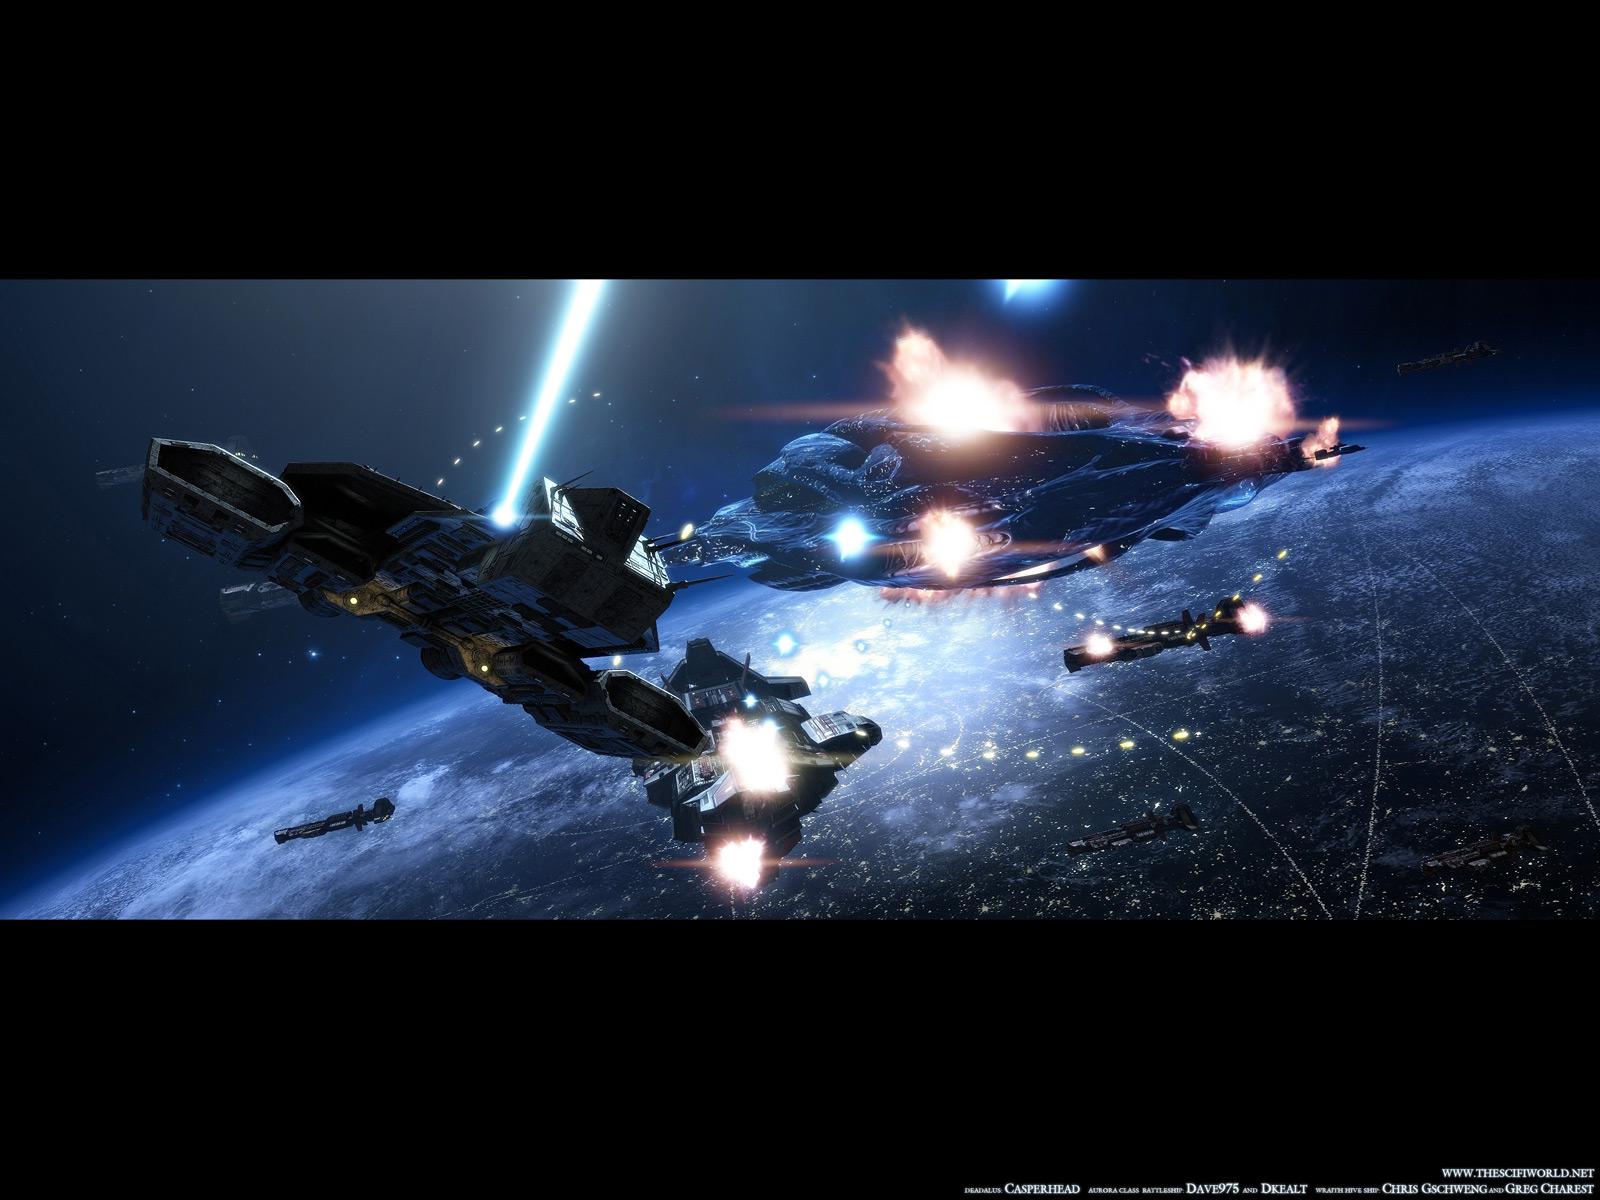 Space War Wallpaper   HD Wallpapers Lovely 1600x1200